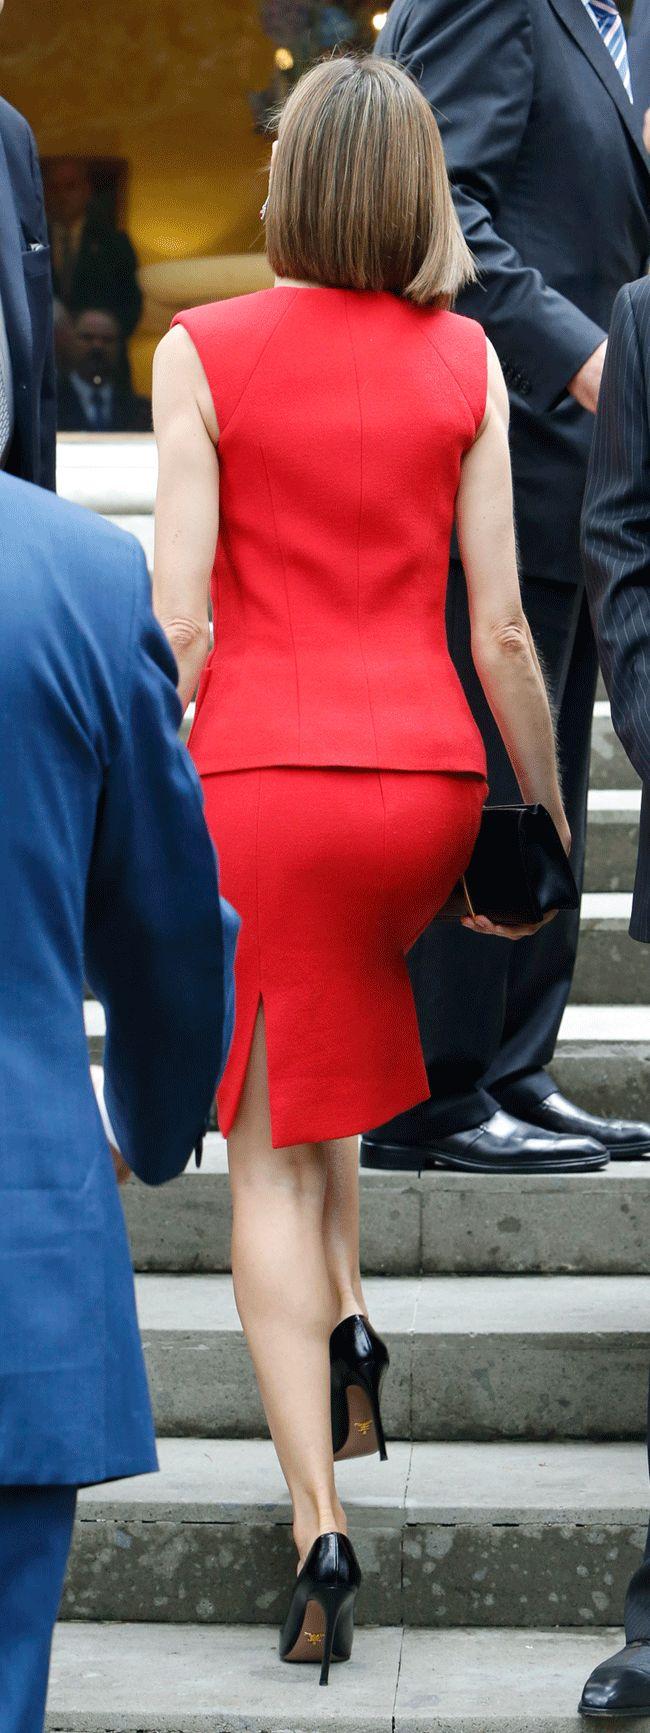 "Spain's Queen Letizia arrives to the ""Business Meeting Espana-Mexico"" in Mexico City, Mexico, June 30, 2015. REUTERS/Edgard Garrido"